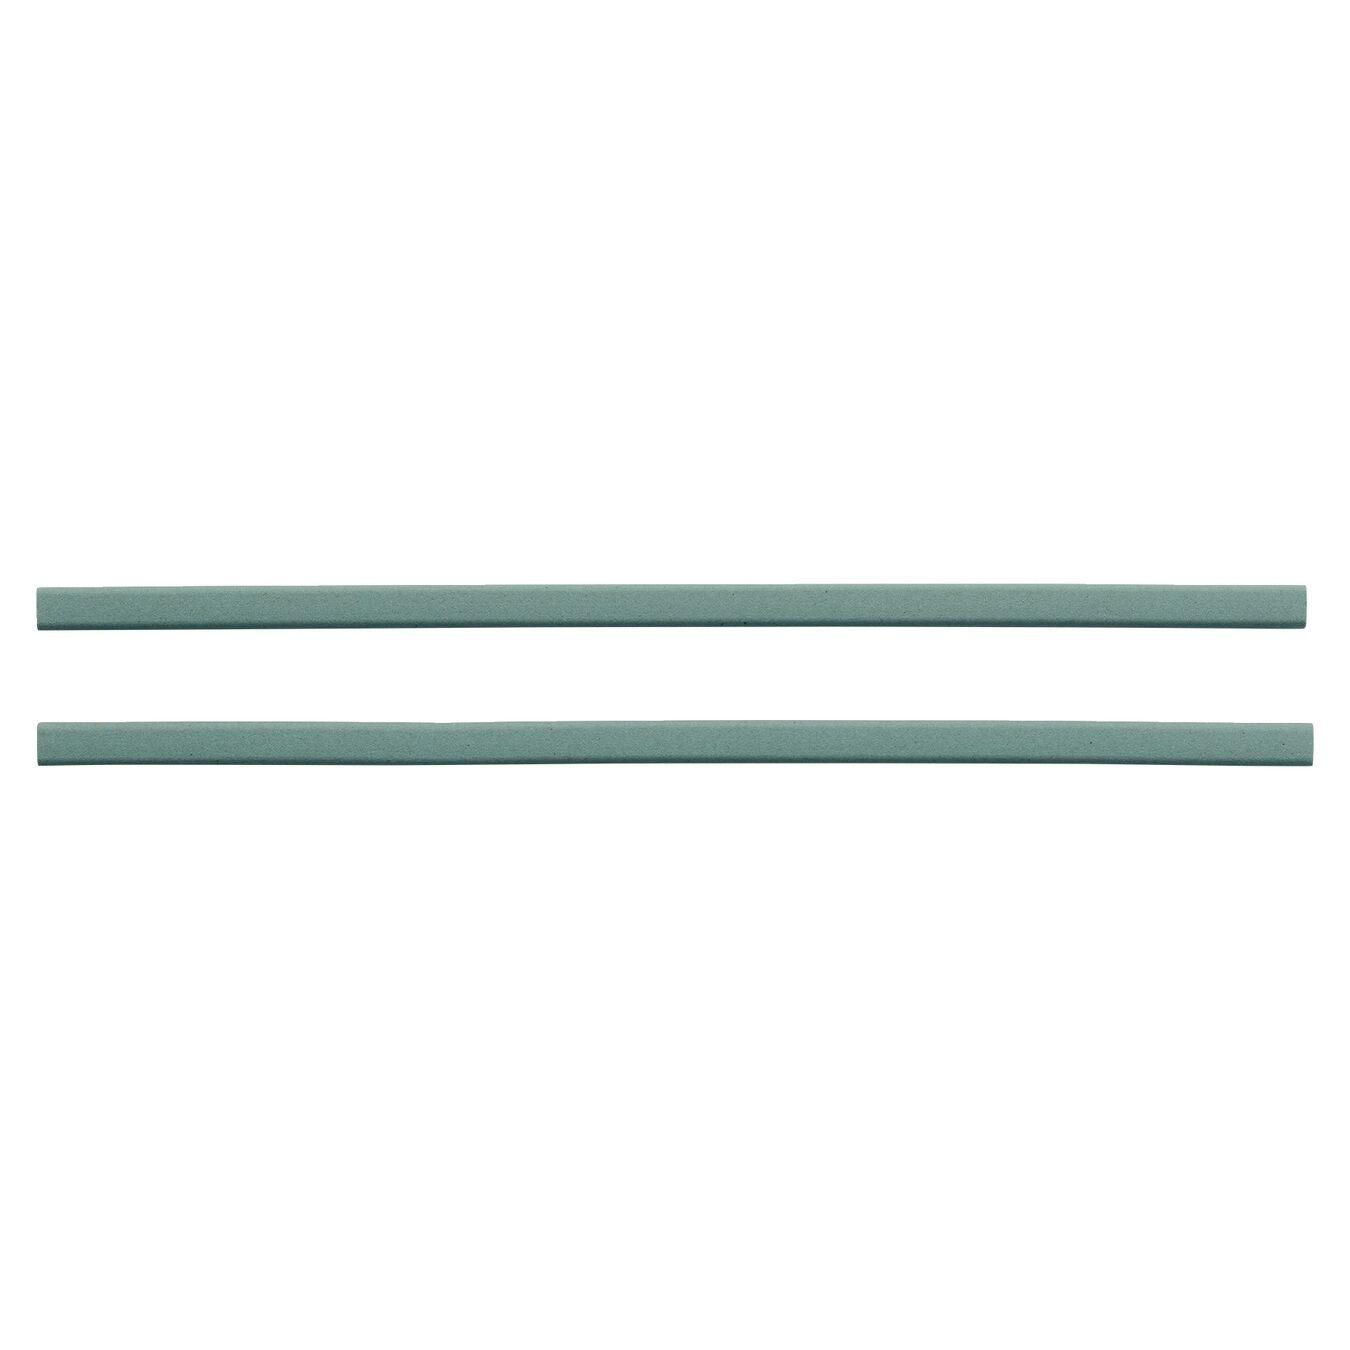 V-Edge 2 Rods Green Medium F360 Grain,,large 1